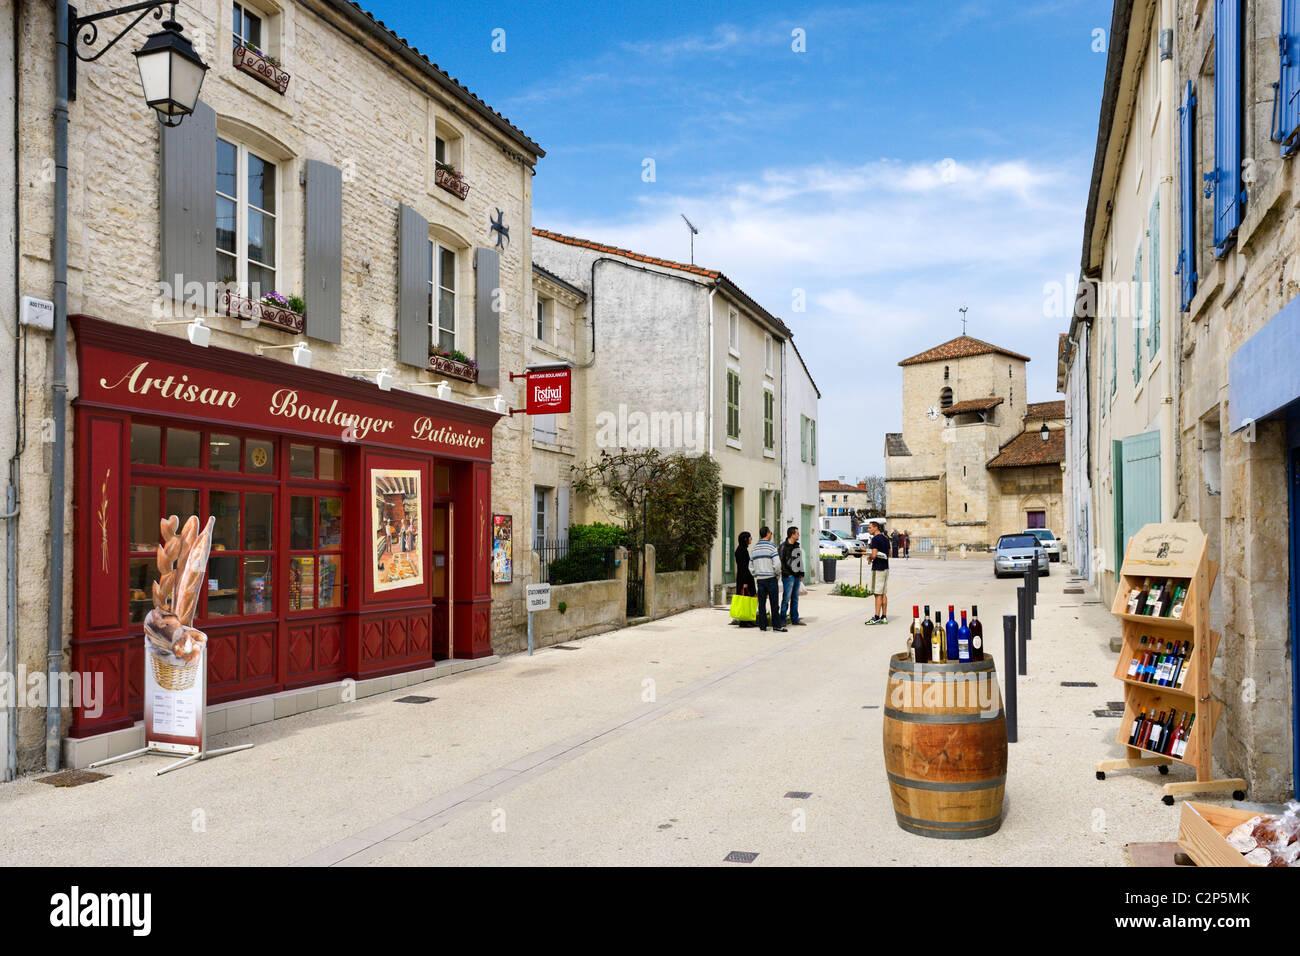 Shops in the village centre, Coulon, Marais Poitevin, Poitou Charentes, France - Stock Image